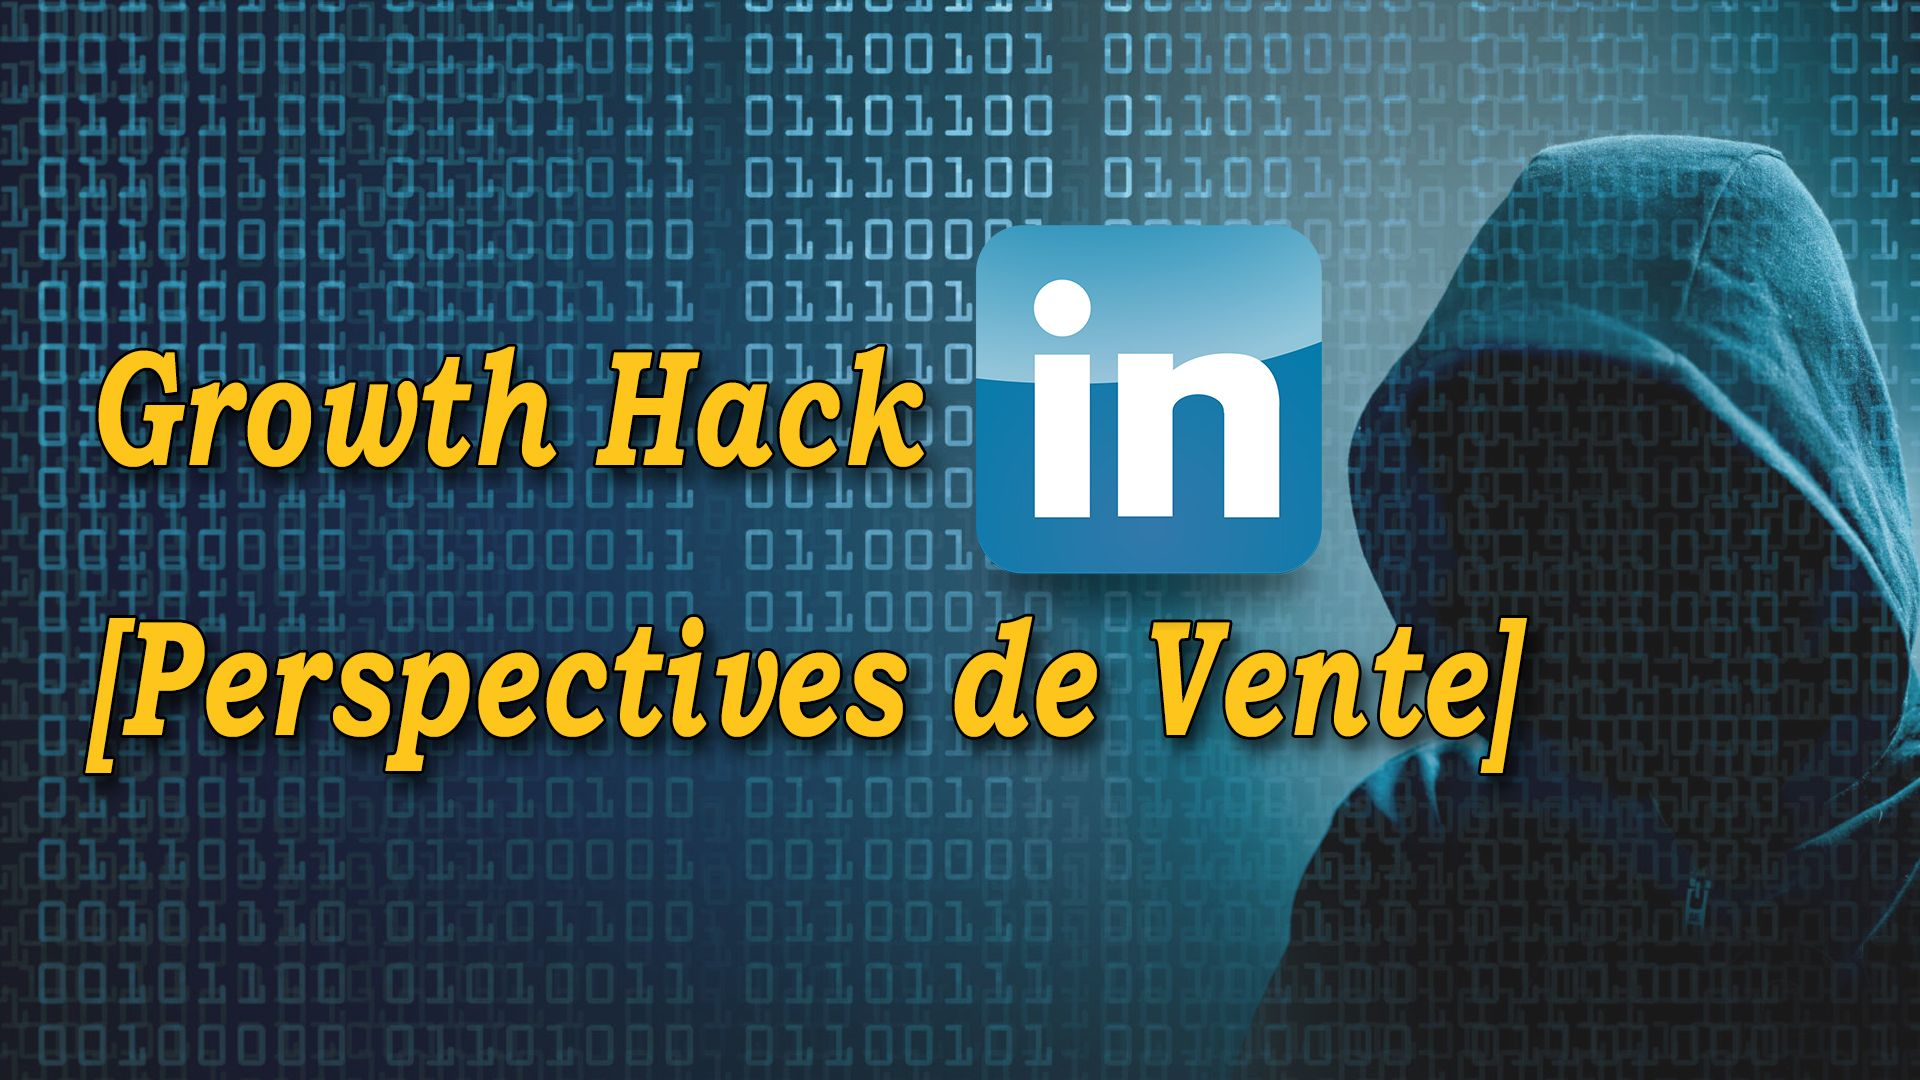 Growth Hack LinkedIn (perspectives de vente) #GrowthHacking #WebMarketing #FormationGrowthHacking #CentreDeFormationFrance #TunnelAARRR #AARRR #SocialMedia #CommunityManagement #SEO #MarketingDigital #SiteWeb